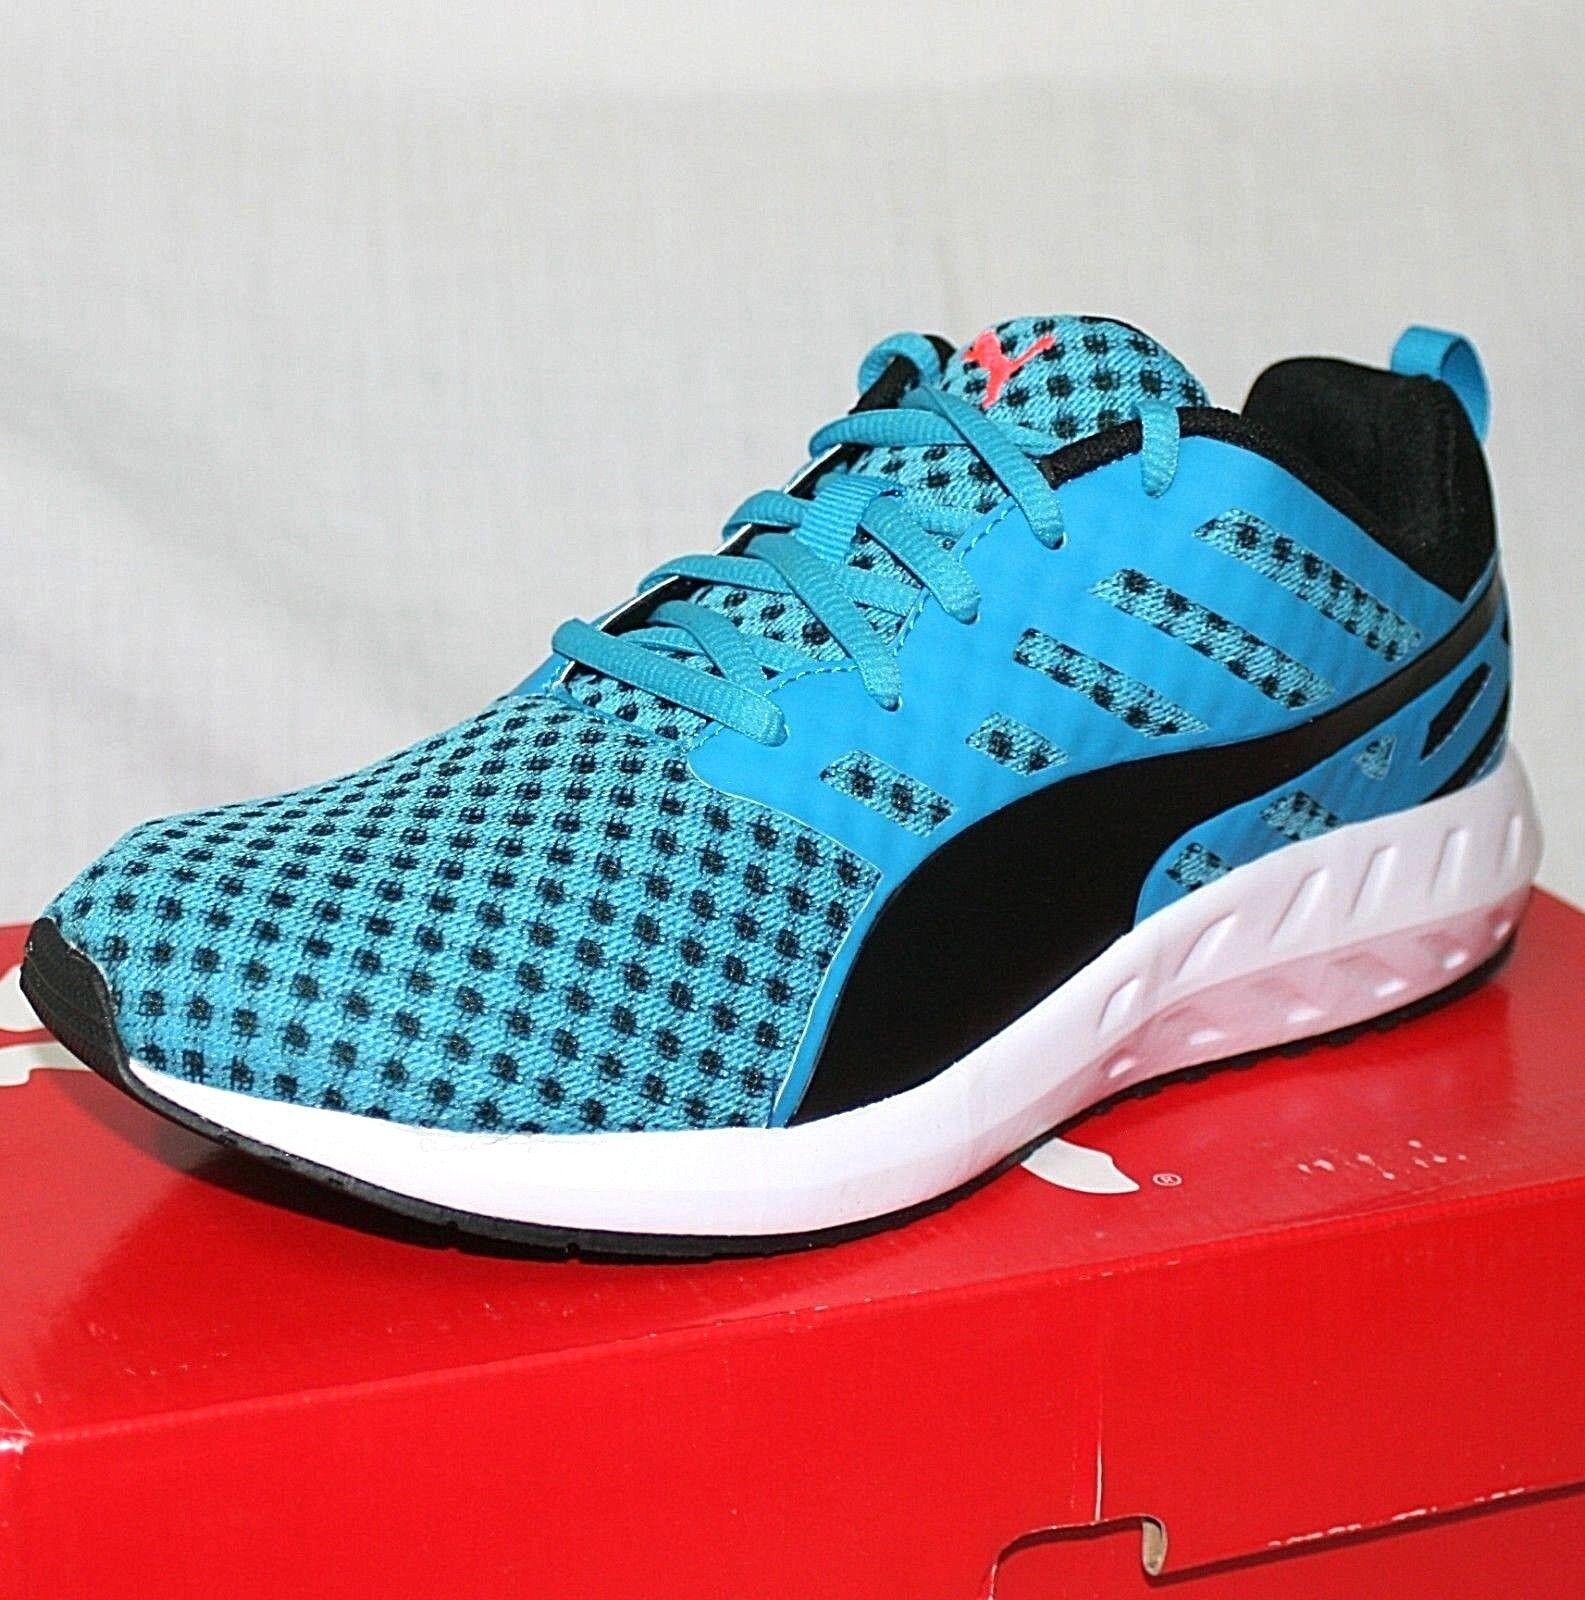 Puma Flare Homme Bleu Amorti Route Gym Running Gym Route Fitness Chaussures De Sport Baskets sz 8ba740